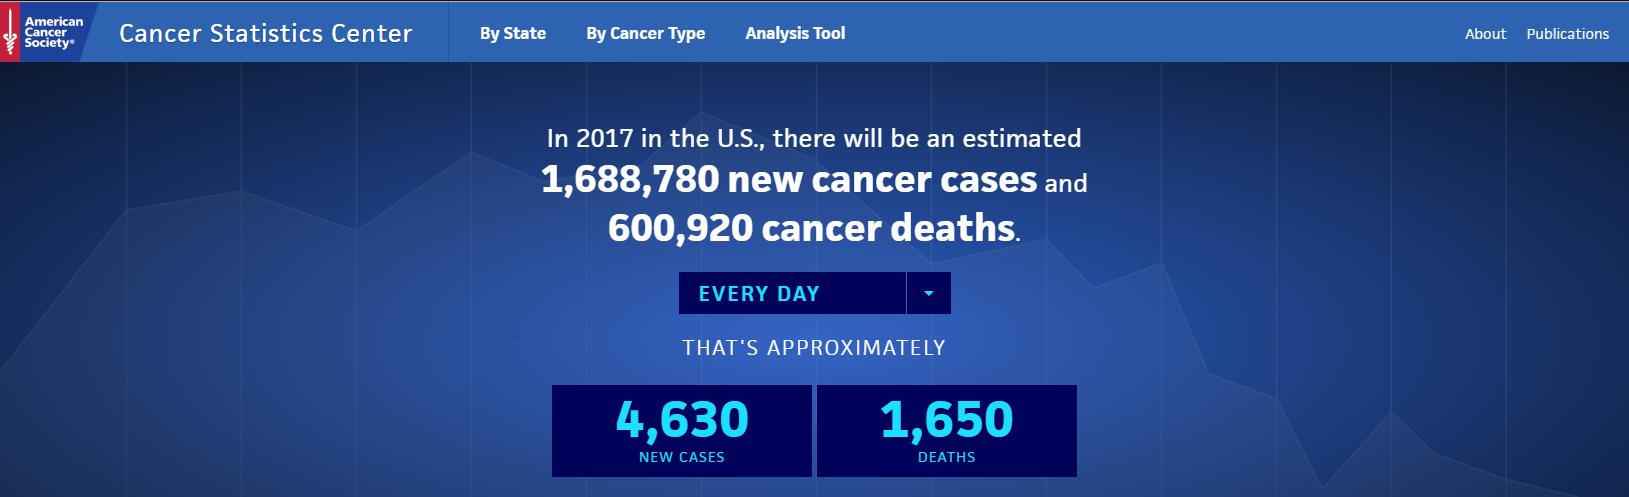 Cancer Crisis Statistics